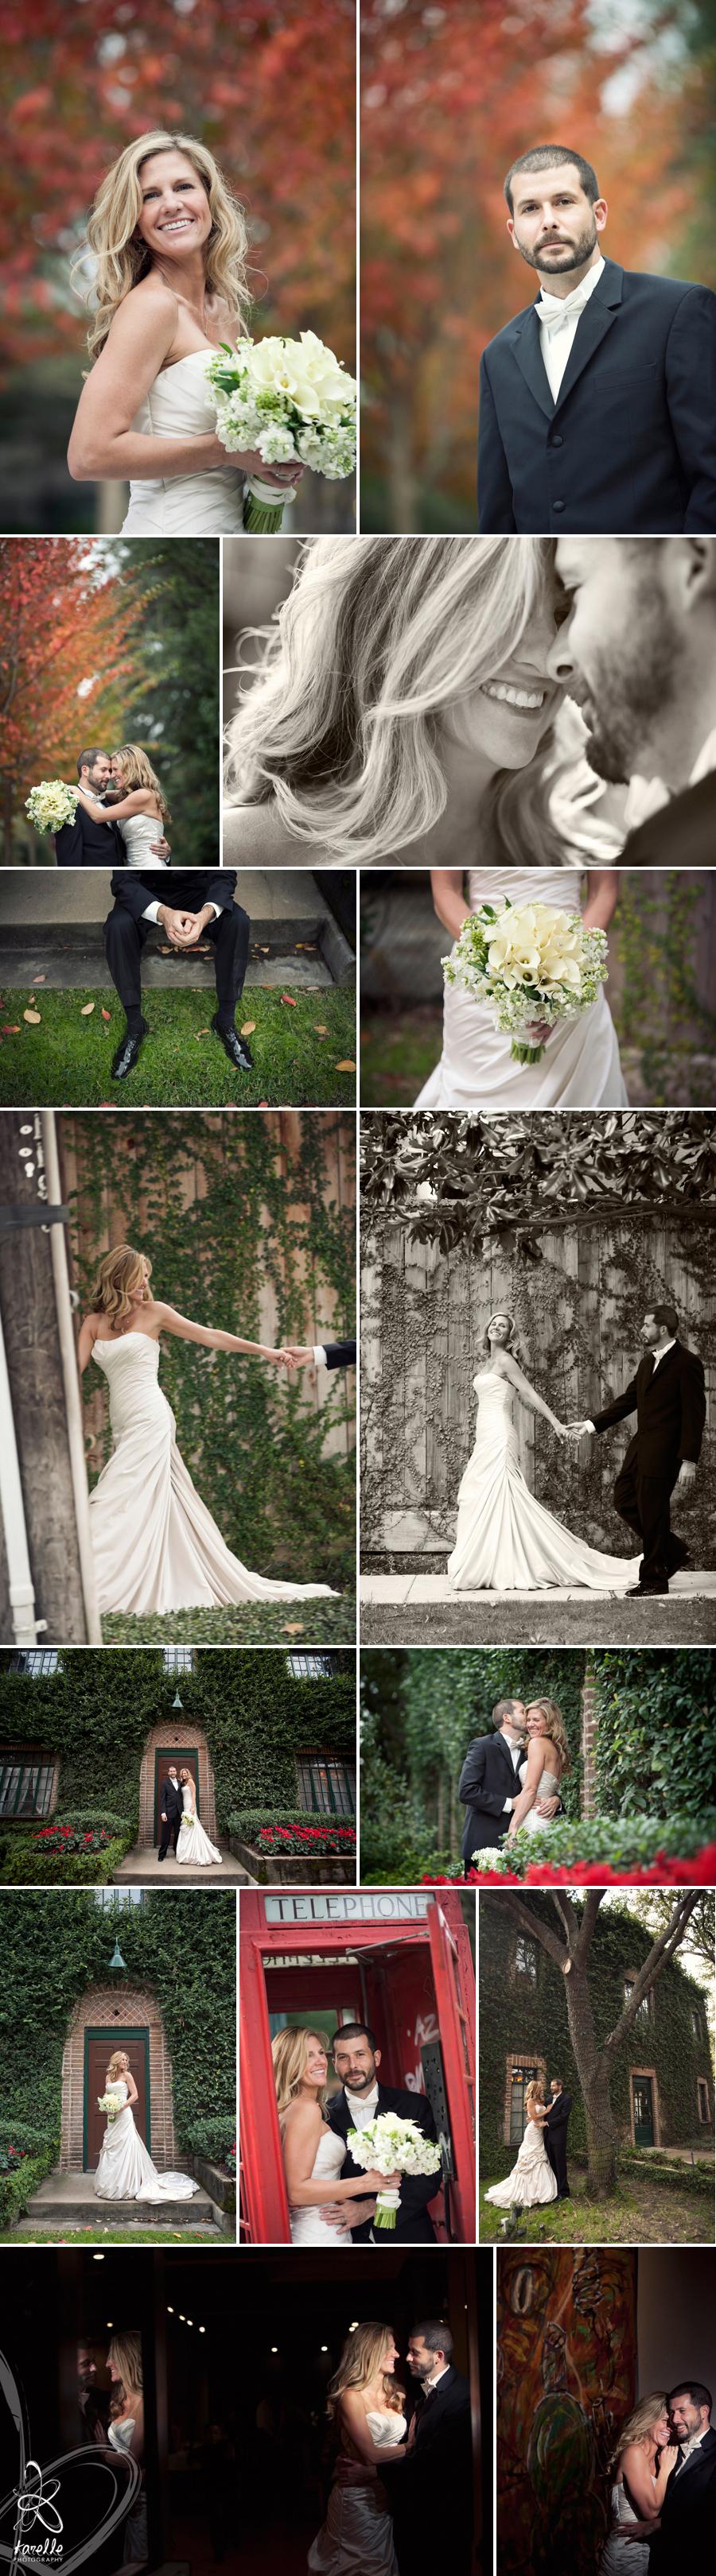 Stephanie and Brian's wedding day, portraits